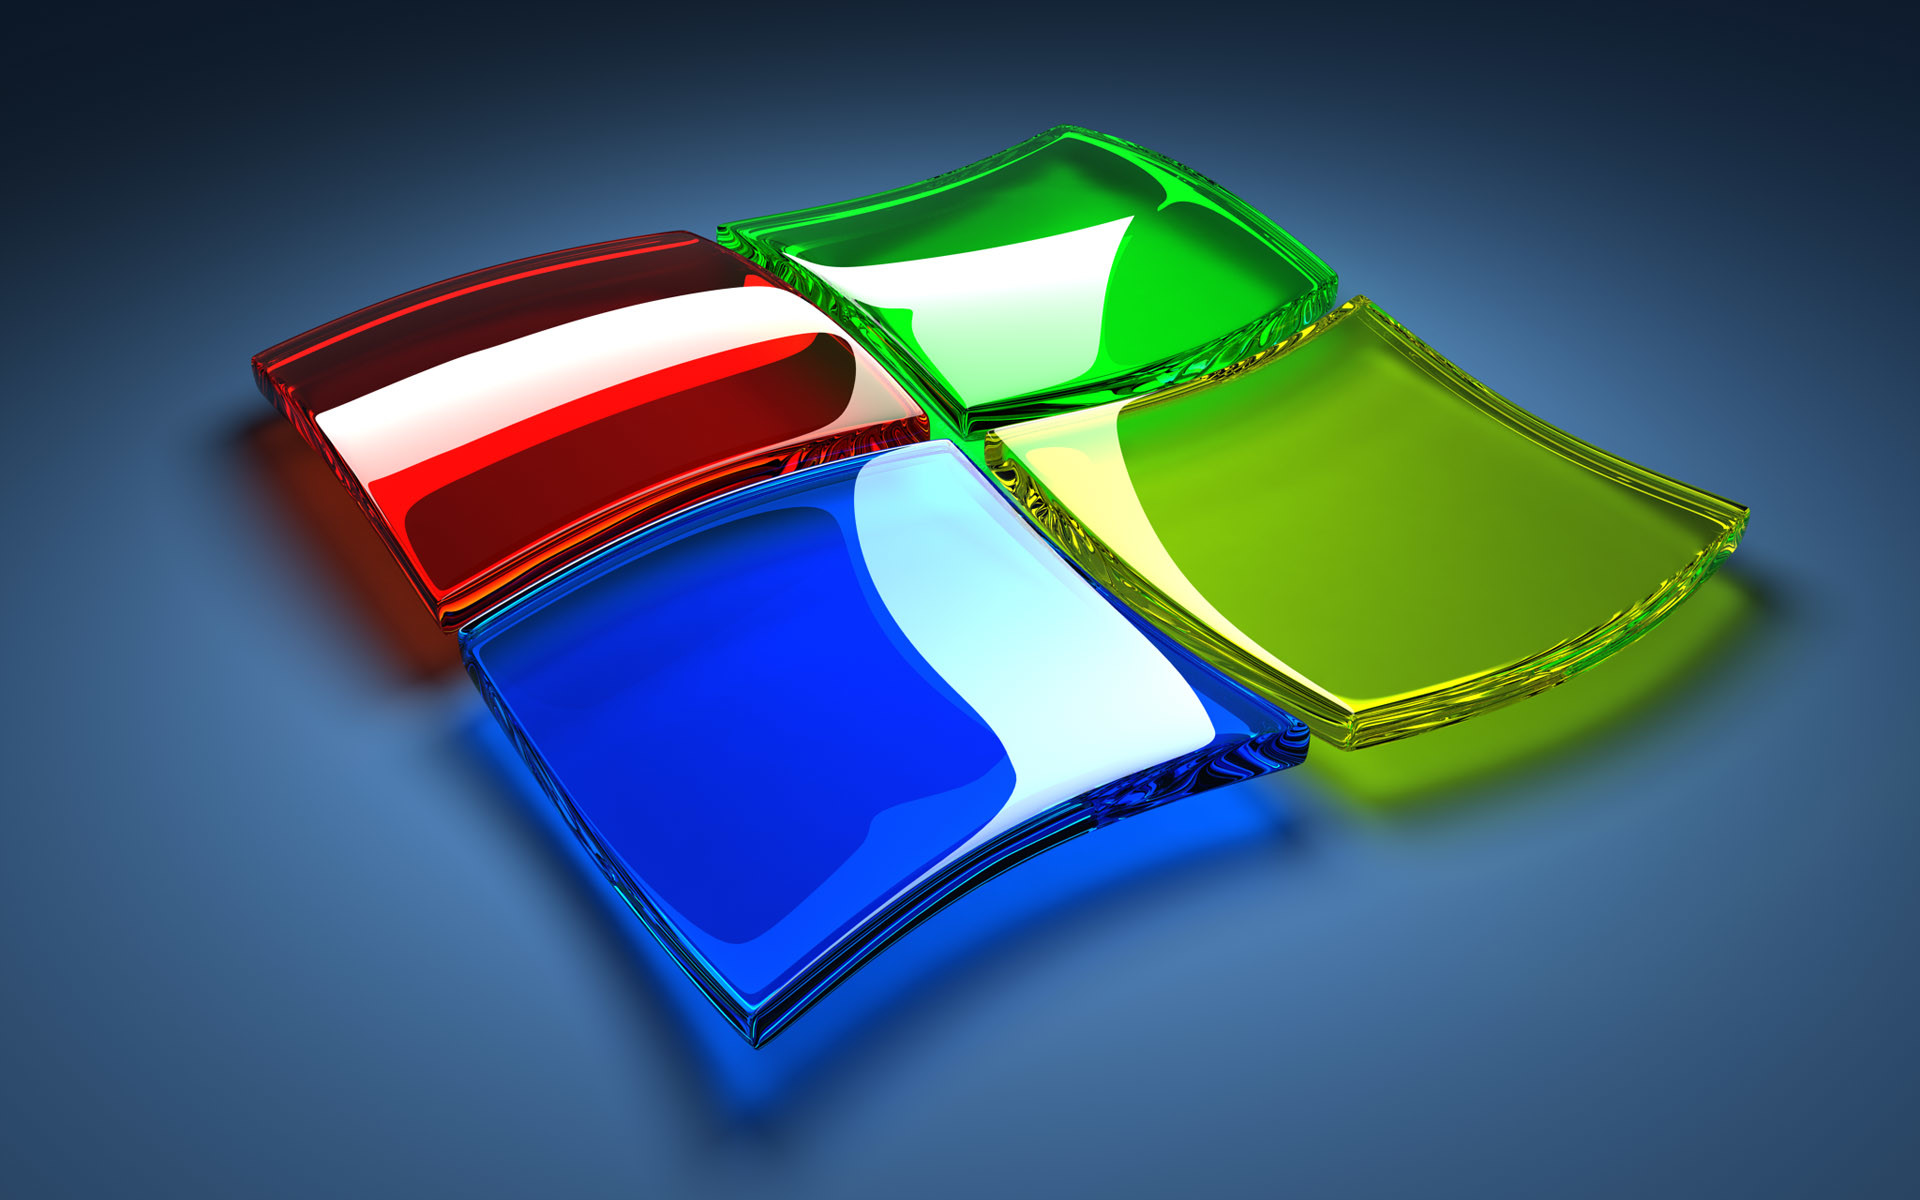 3d Desktop Backgrounds 55 Images